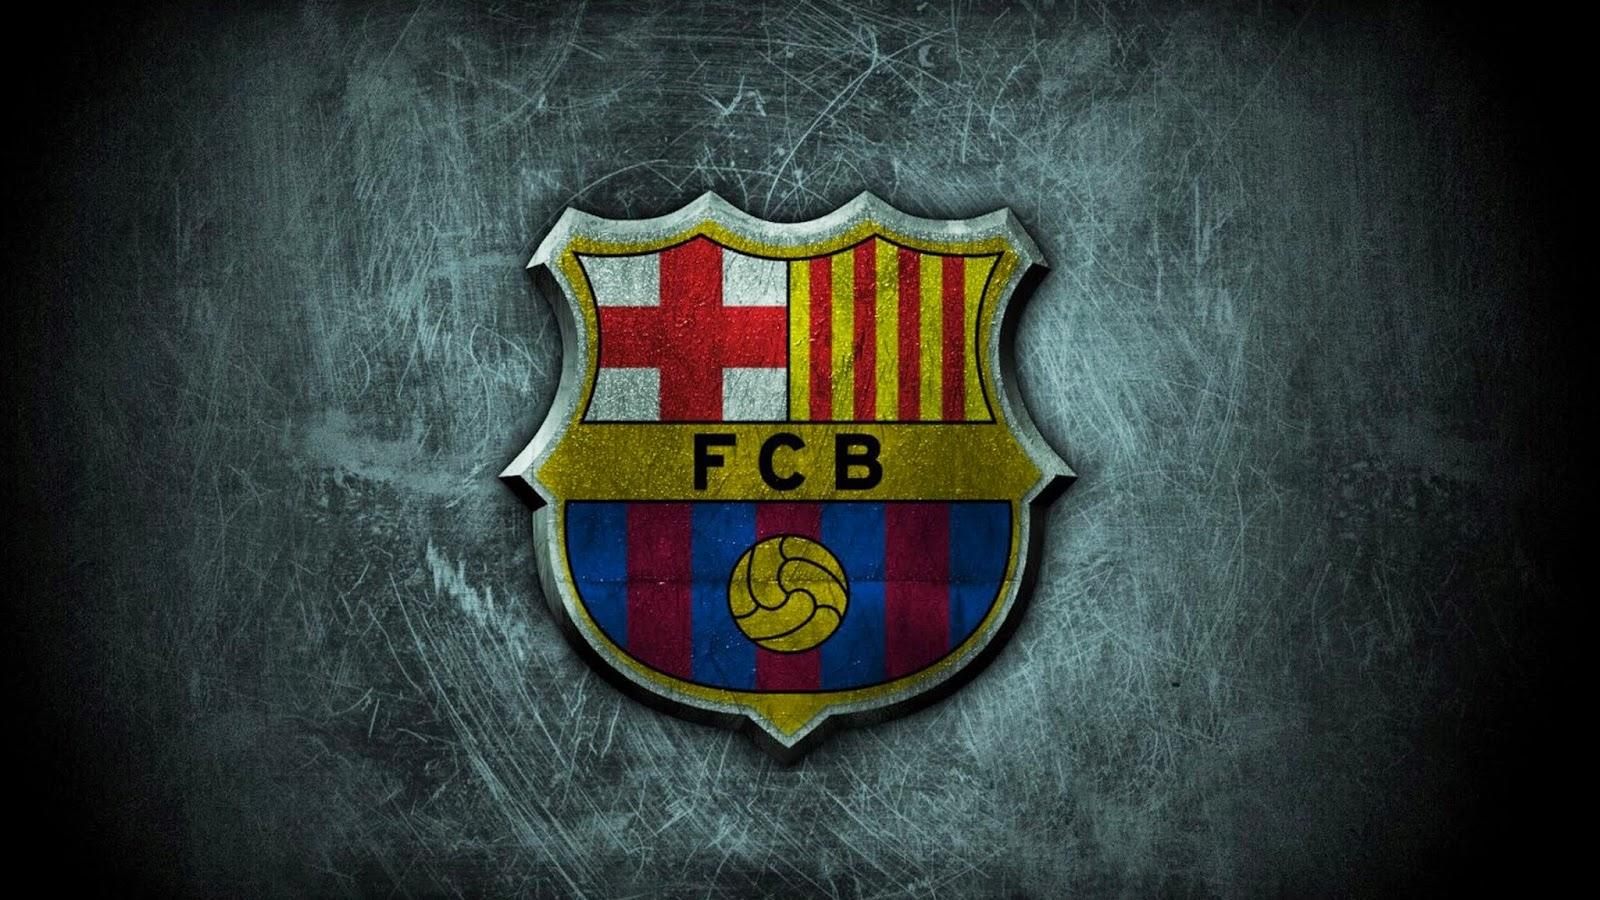 Wallpaper Keren Logo Fc Barcelona Gambar Kartun Lucu